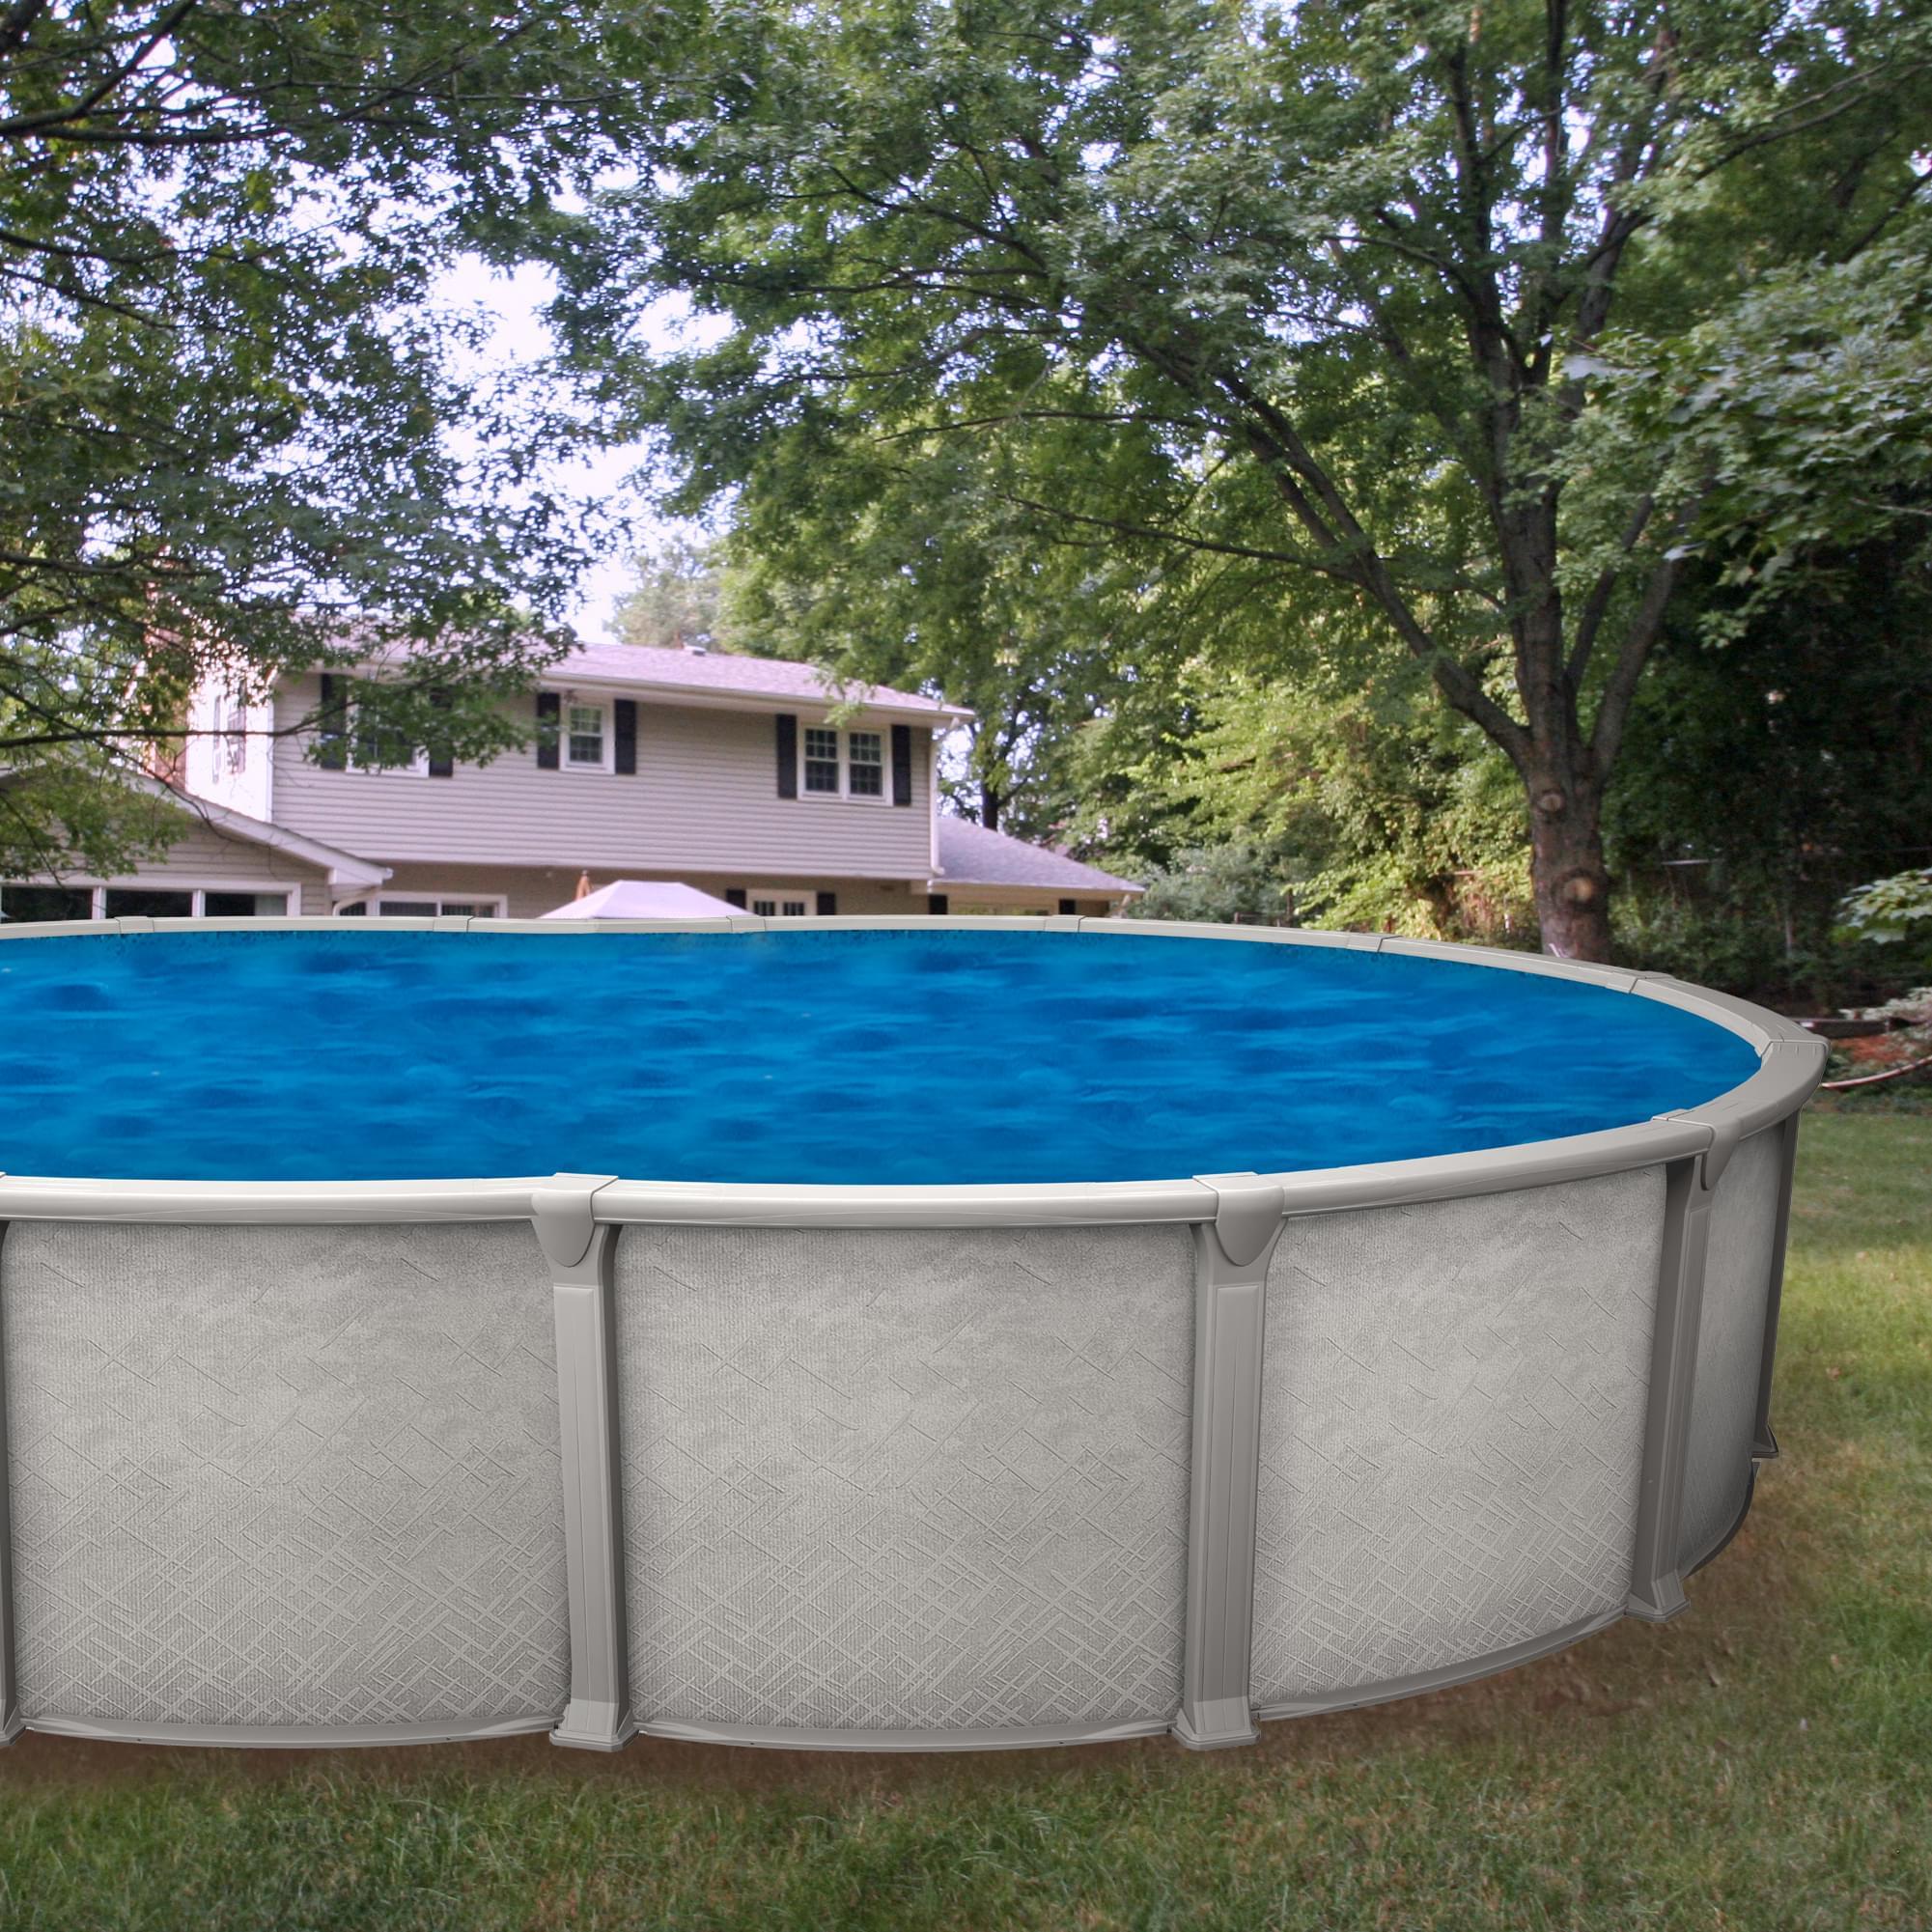 Galaxy 15 x 30 pied ovale piscine ho magasin de piscine for Chauffe eau piscine hors terre prix